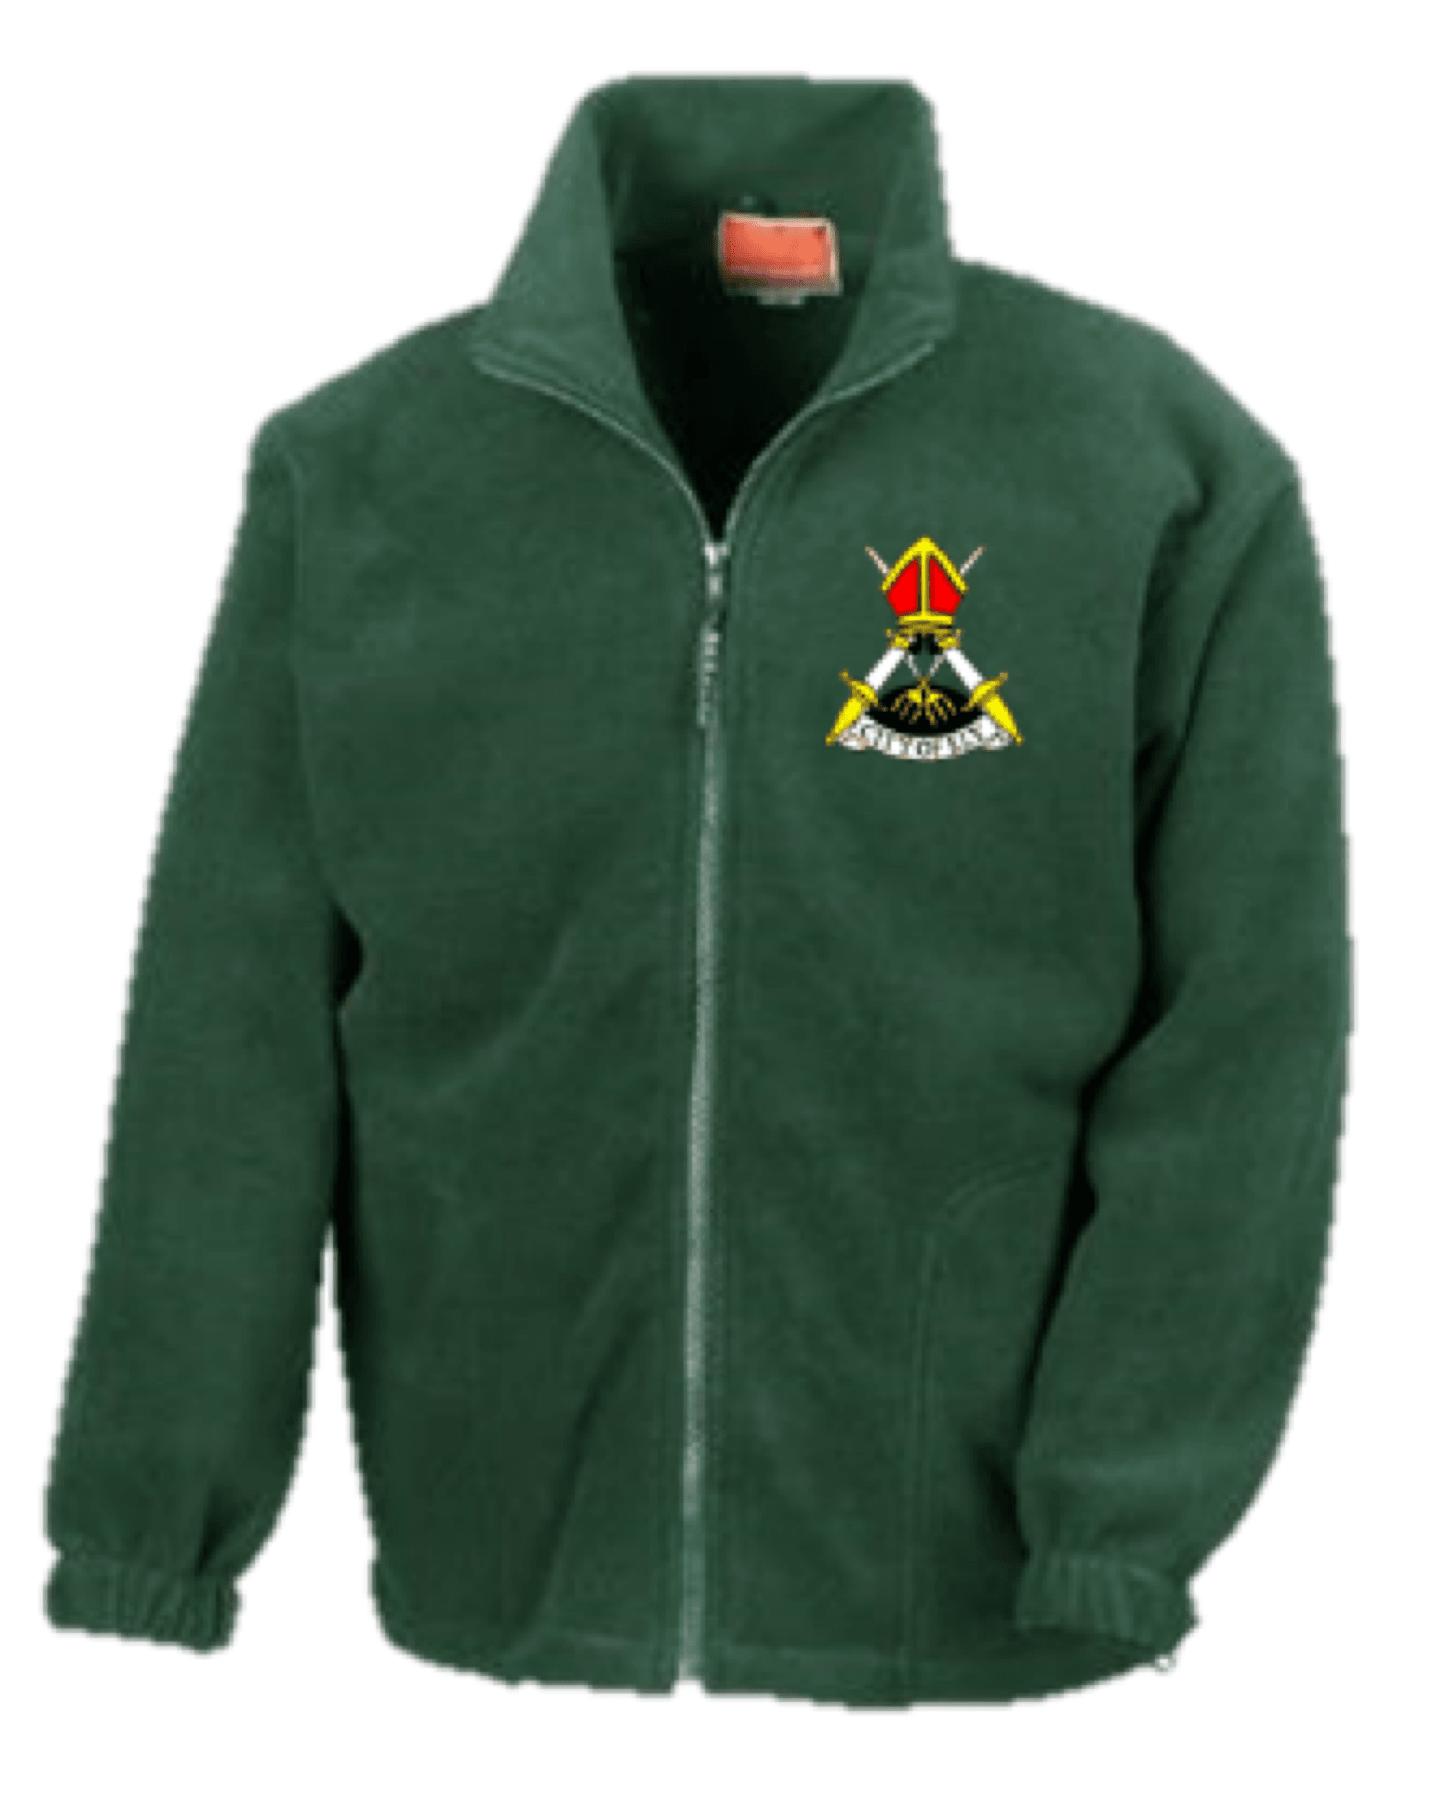 Ely City Hockey Club Fleece